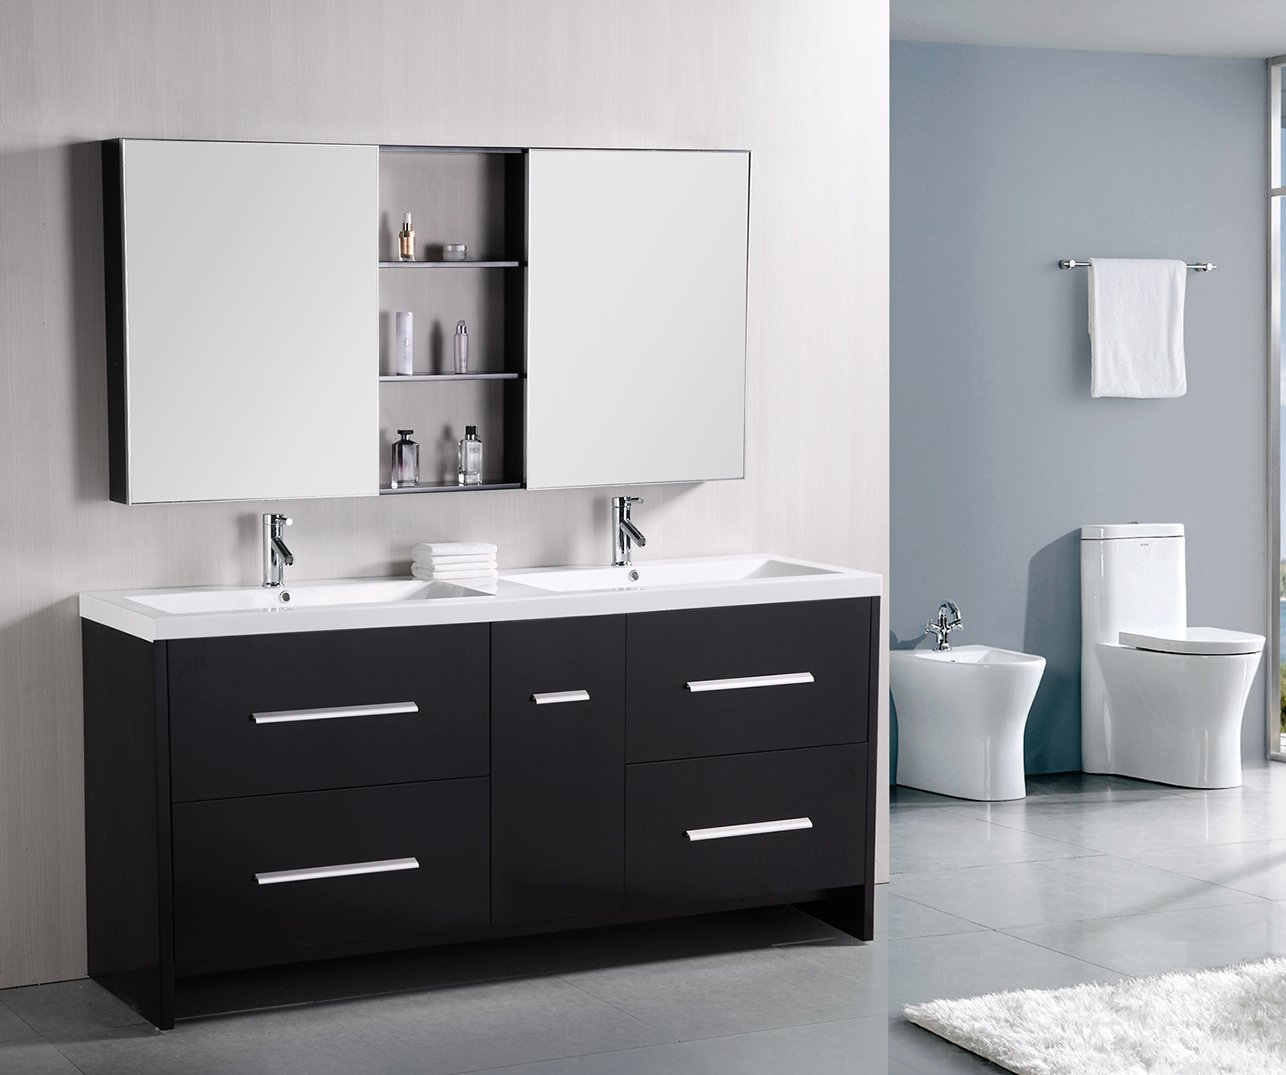 bathroom cabinets double sink. Design Element Perfecta Double Integrated White Acrylic Drop-in Sink Vanity Set, 72-Inch - Bathroom Vanities Amazon.com Cabinets N